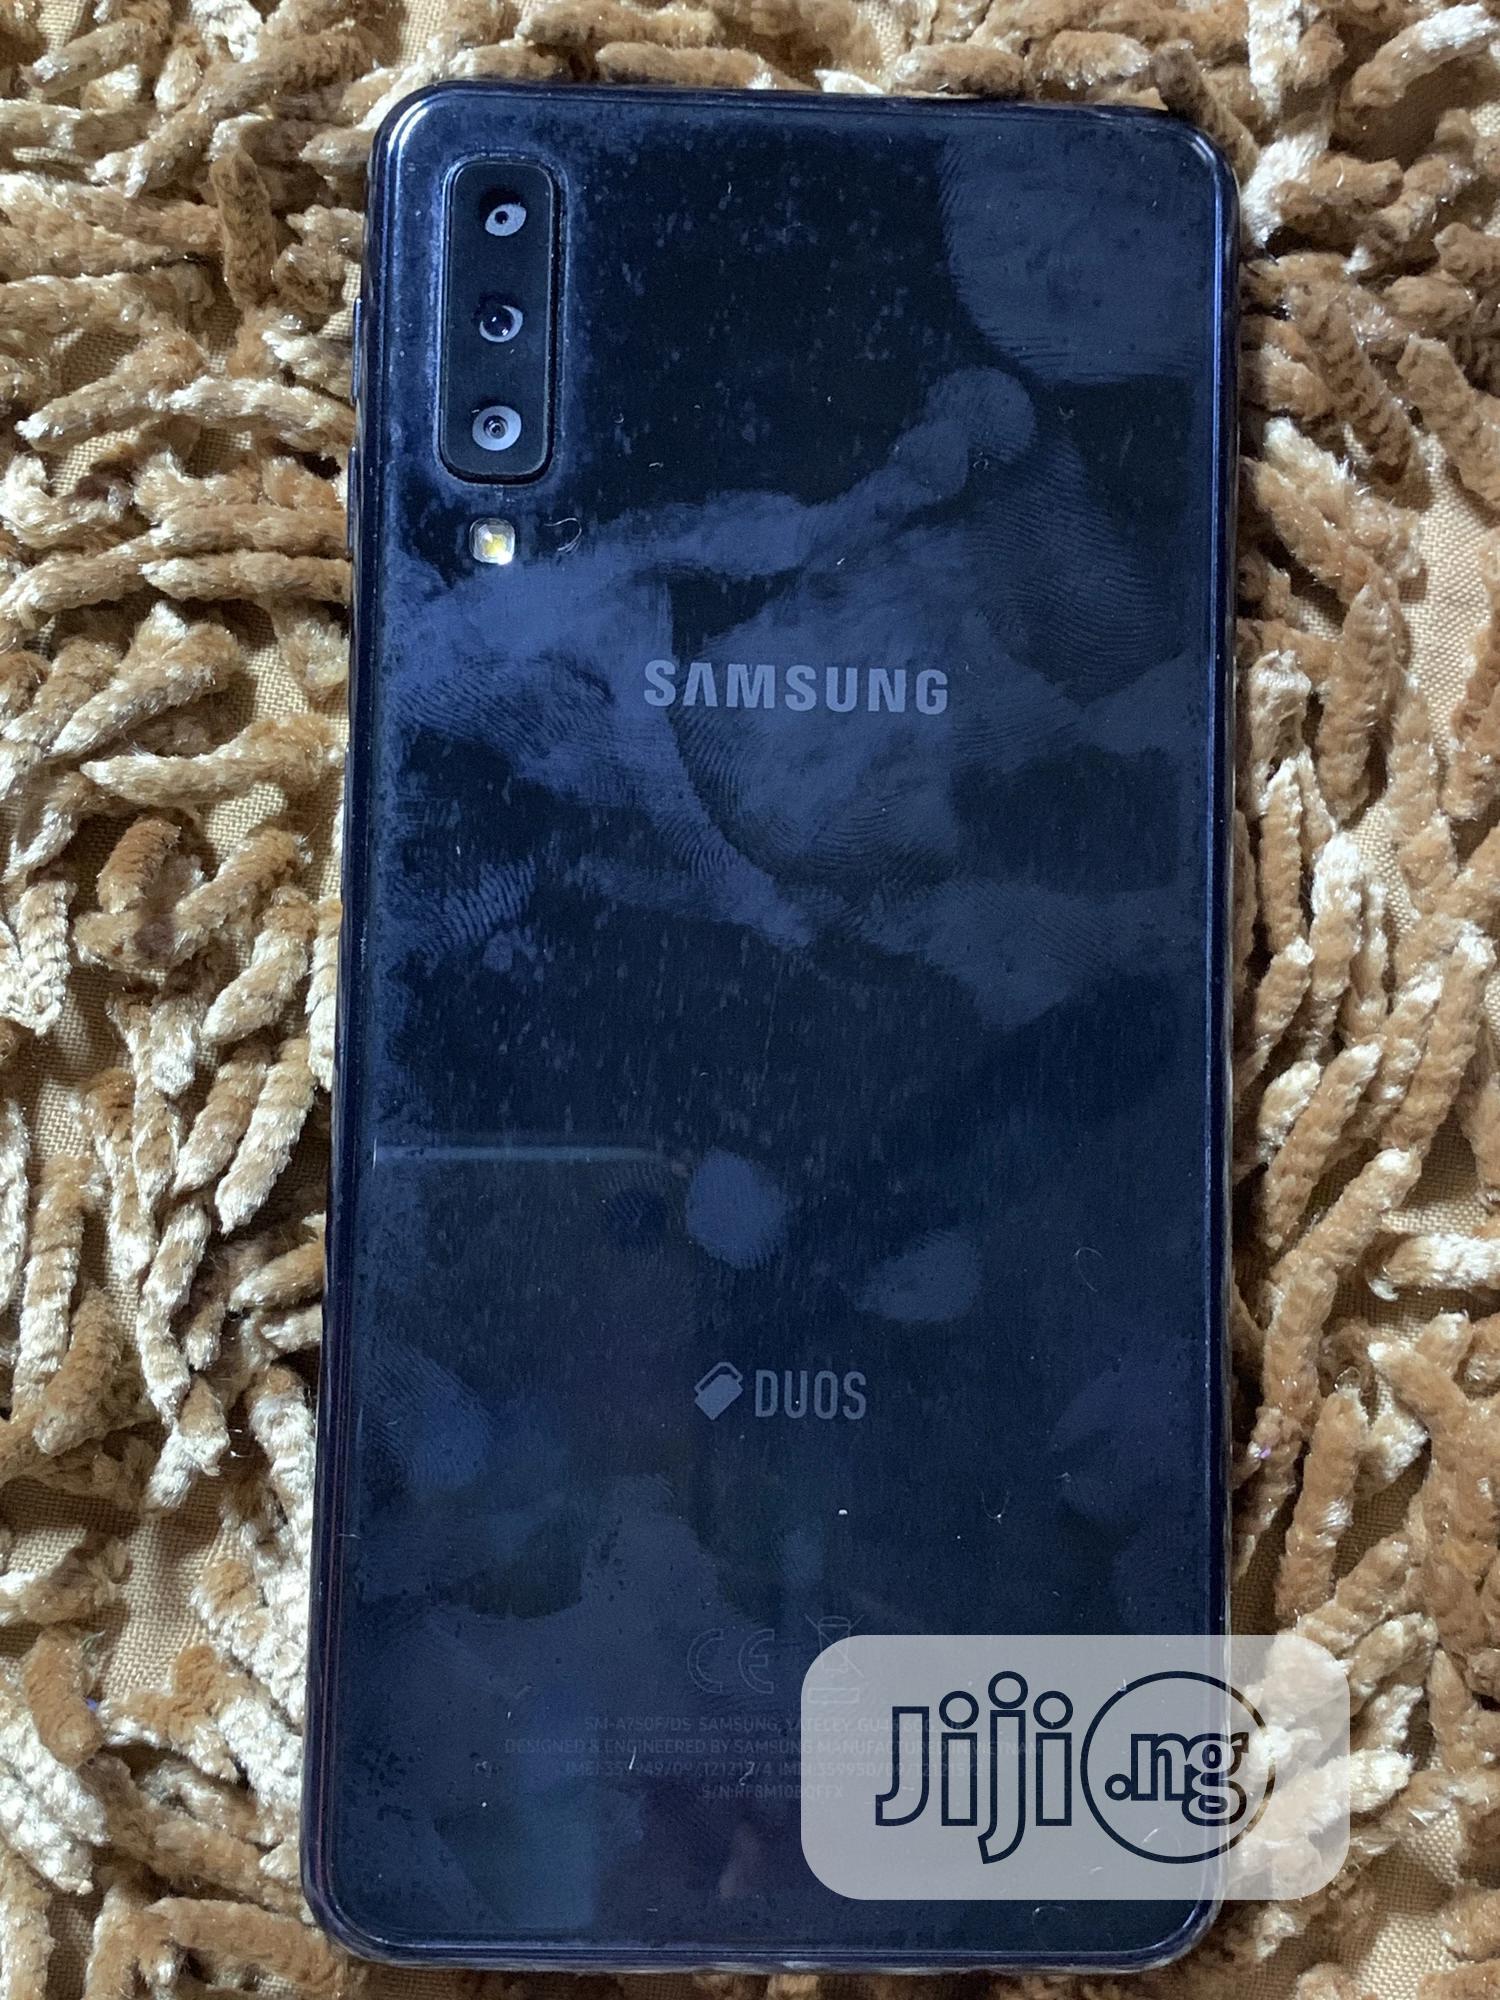 Archive: Samsung Galaxy A7 Duos 16 GB Gray